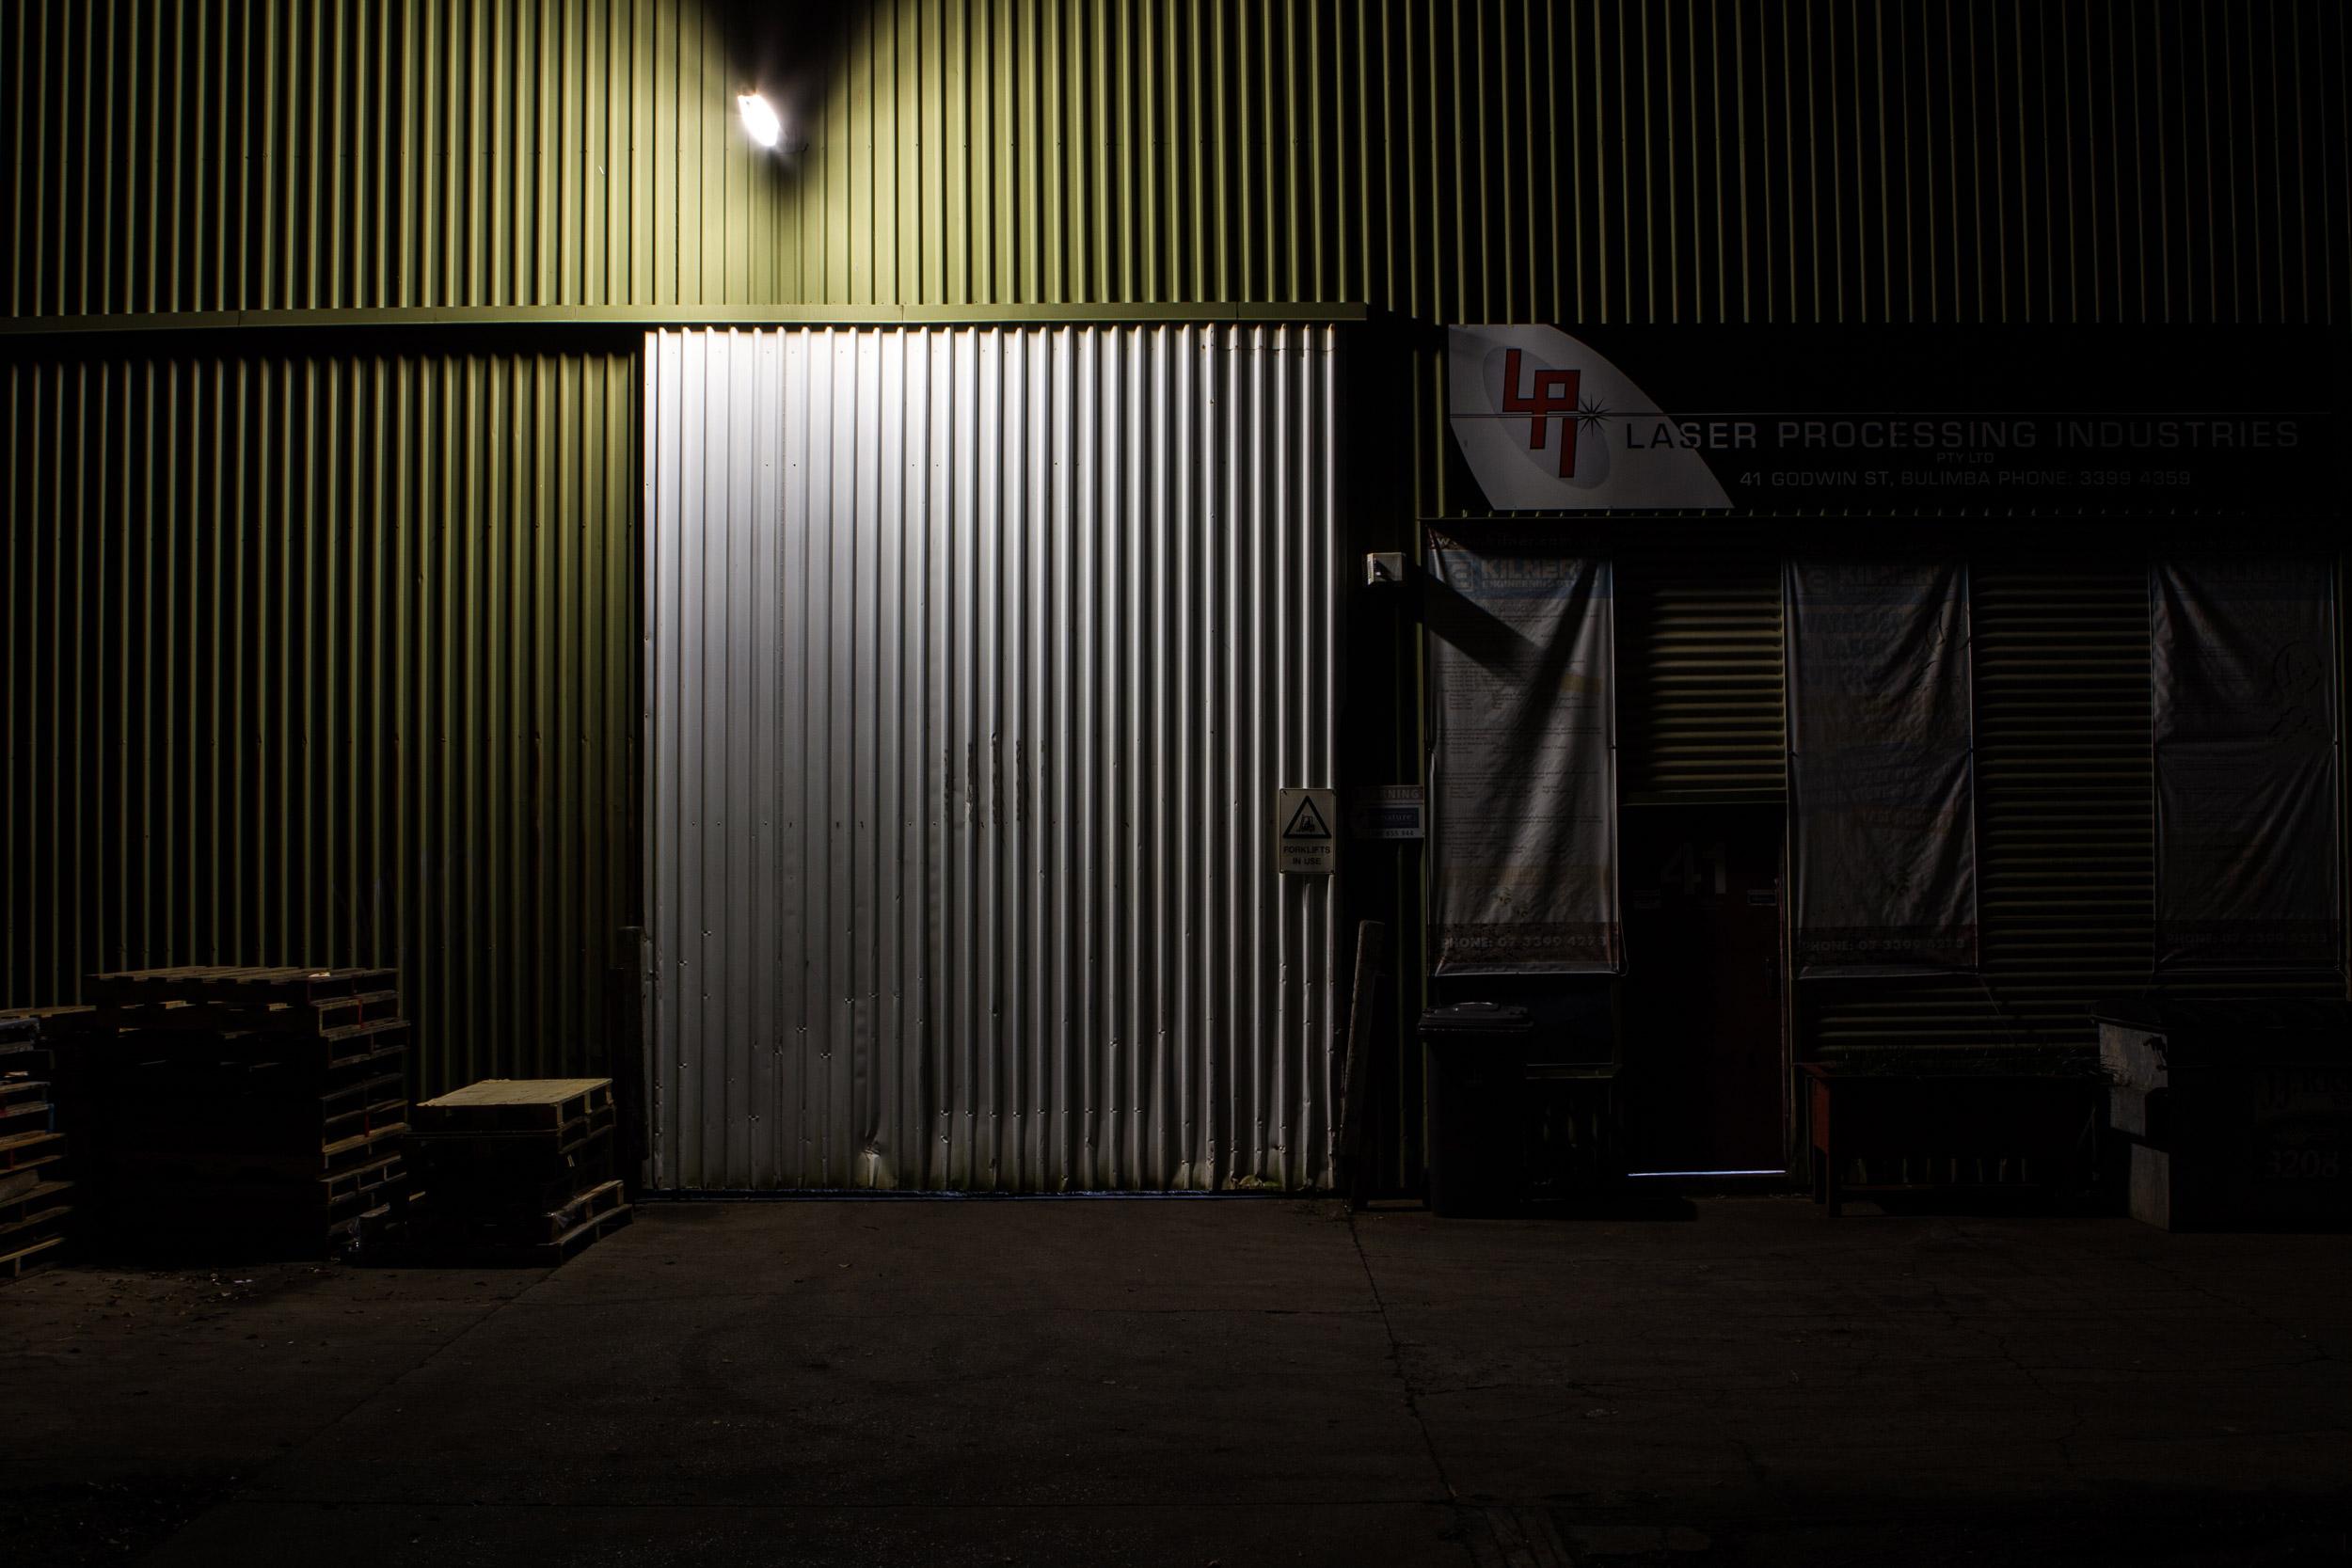 A warehouse at night in Bulimba, Brisbane